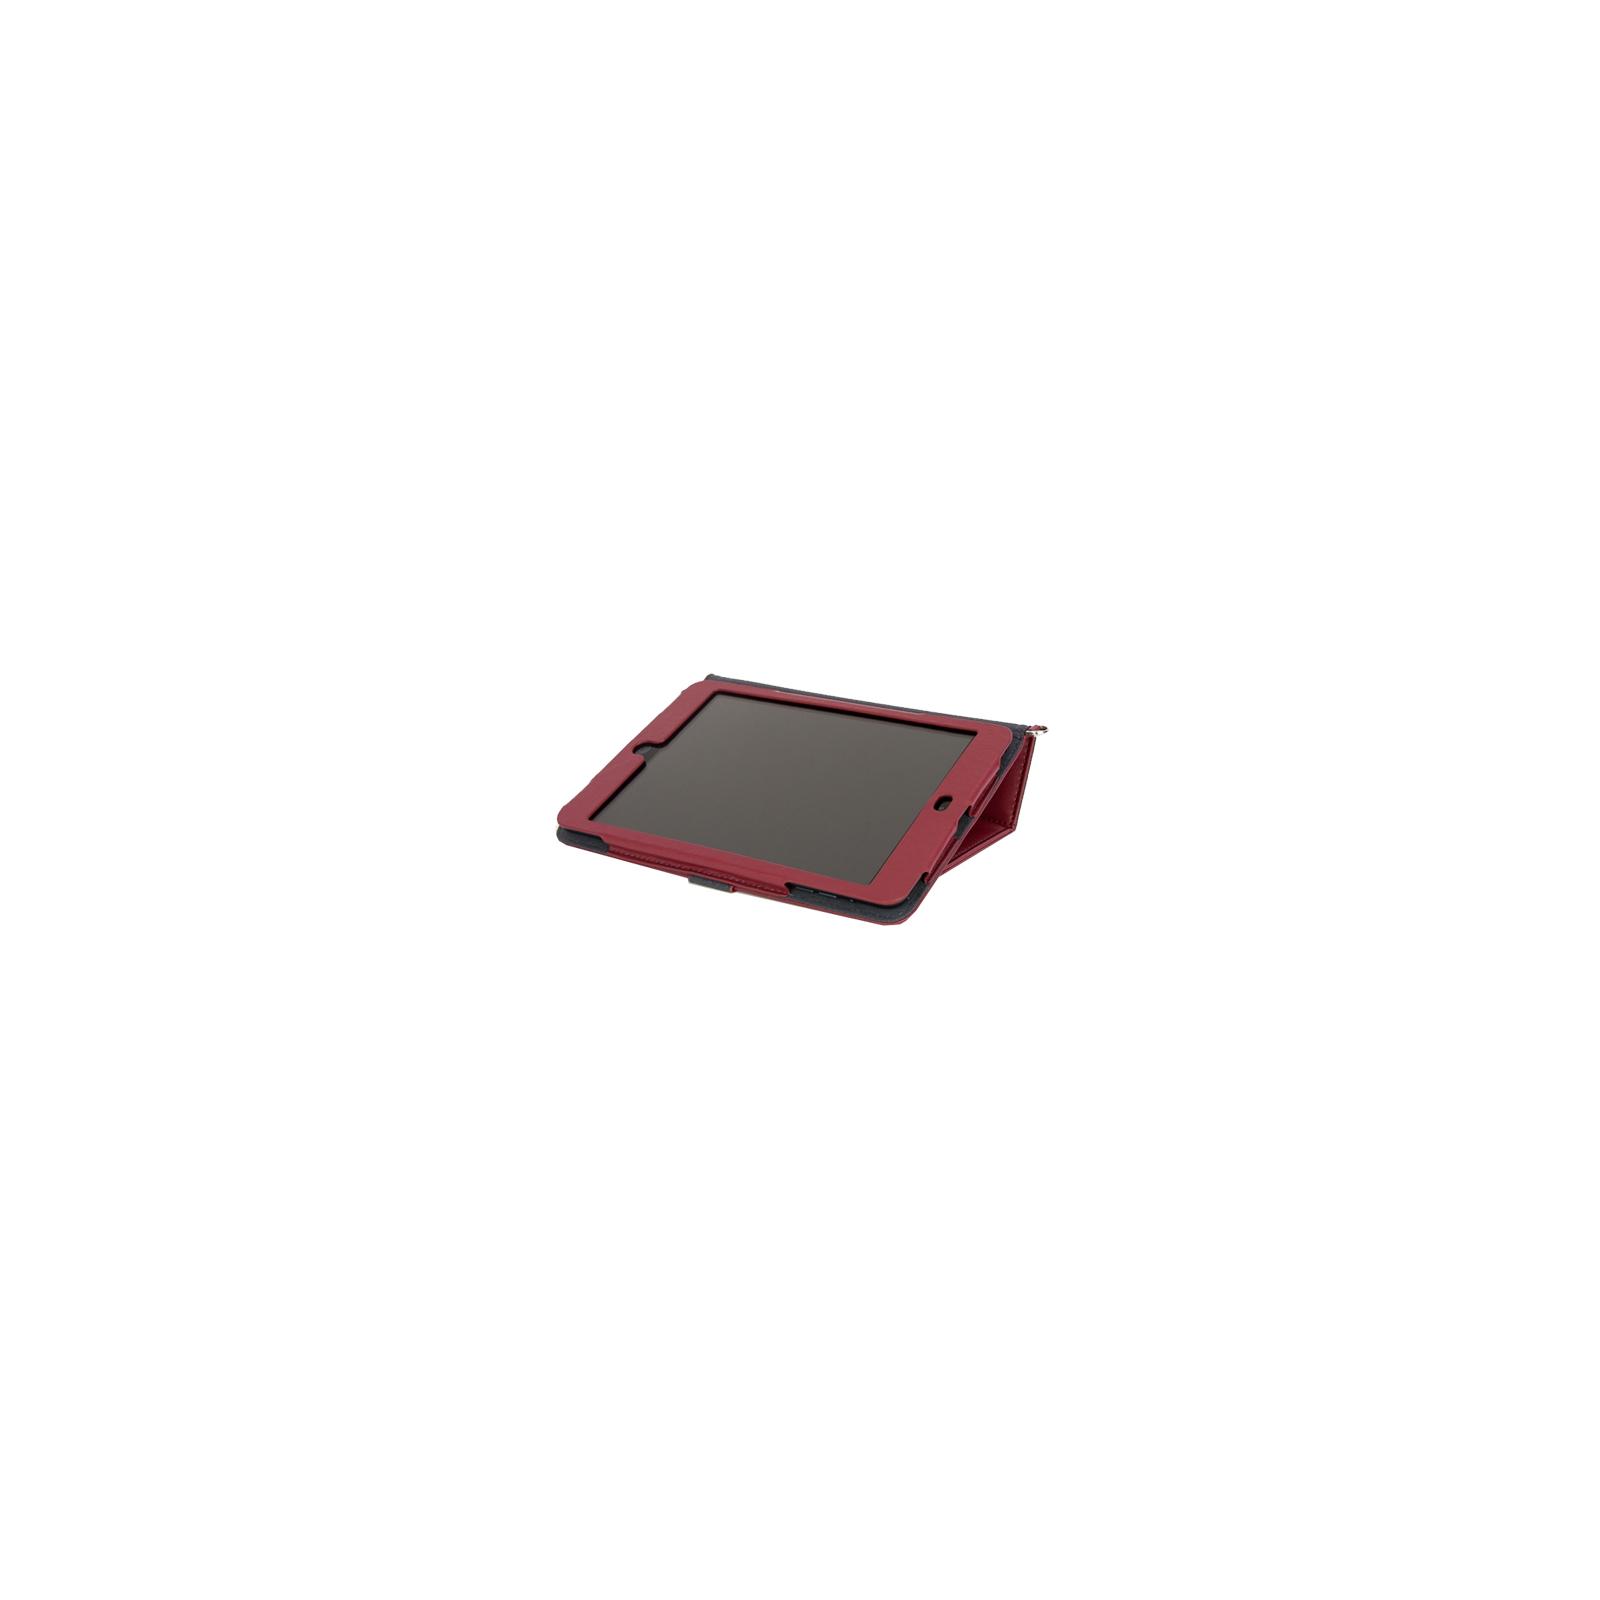 Чехол для планшета ODOYO IPAD AIR /GENUINE LEATHER FOLIO RED (PA536RD) изображение 7